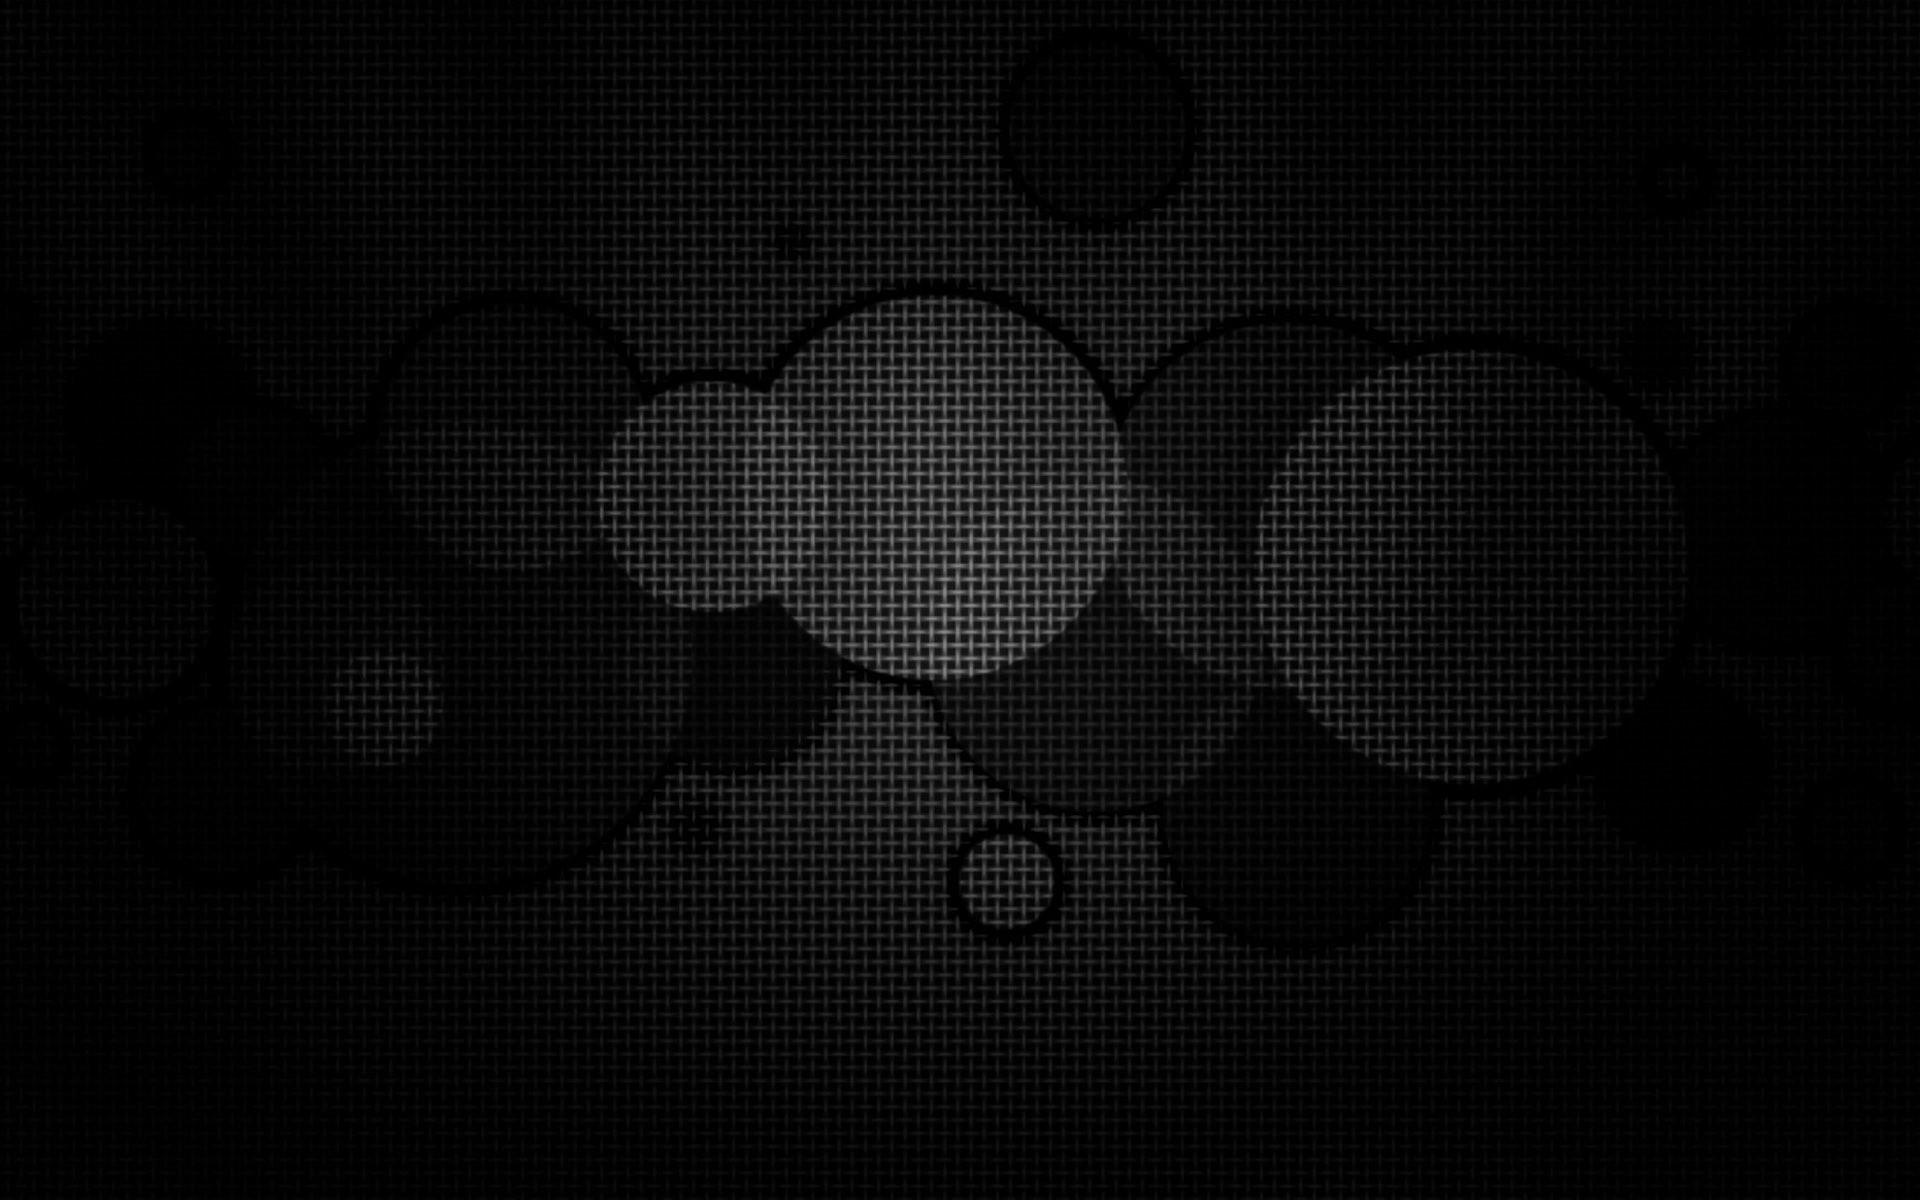 Black Wallpaper Abstract